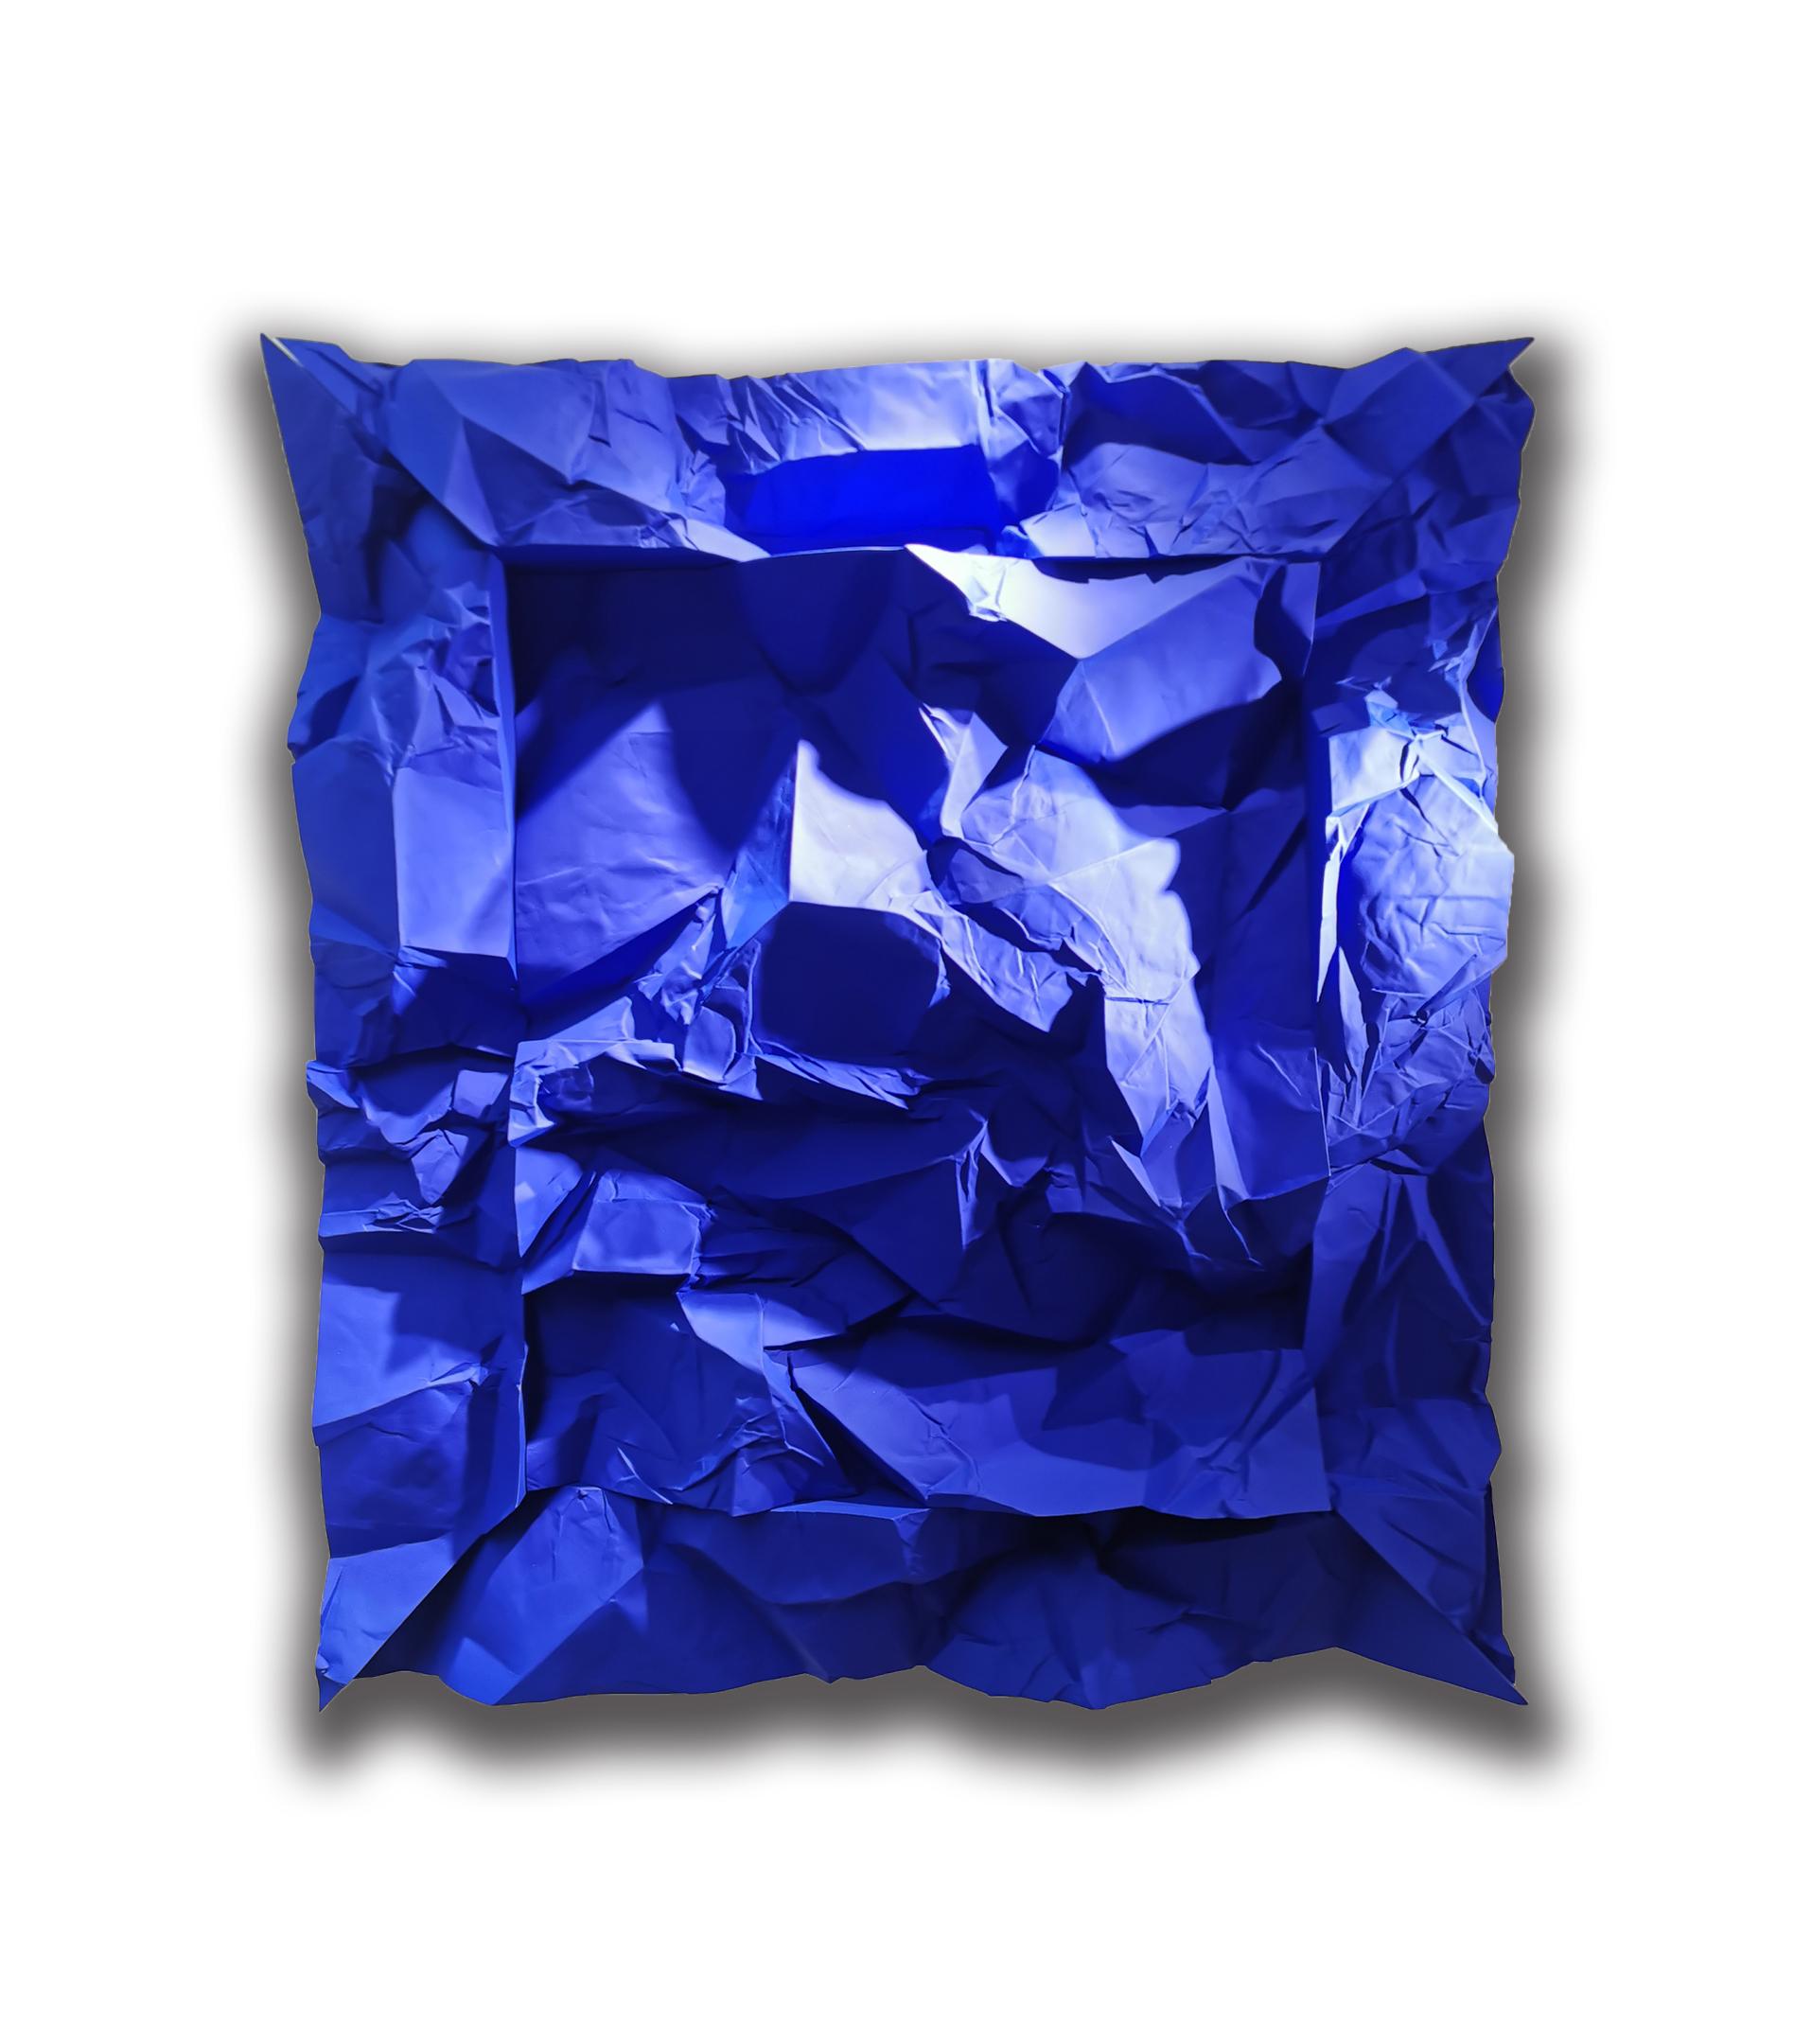 Monade Bleue carrée 2010